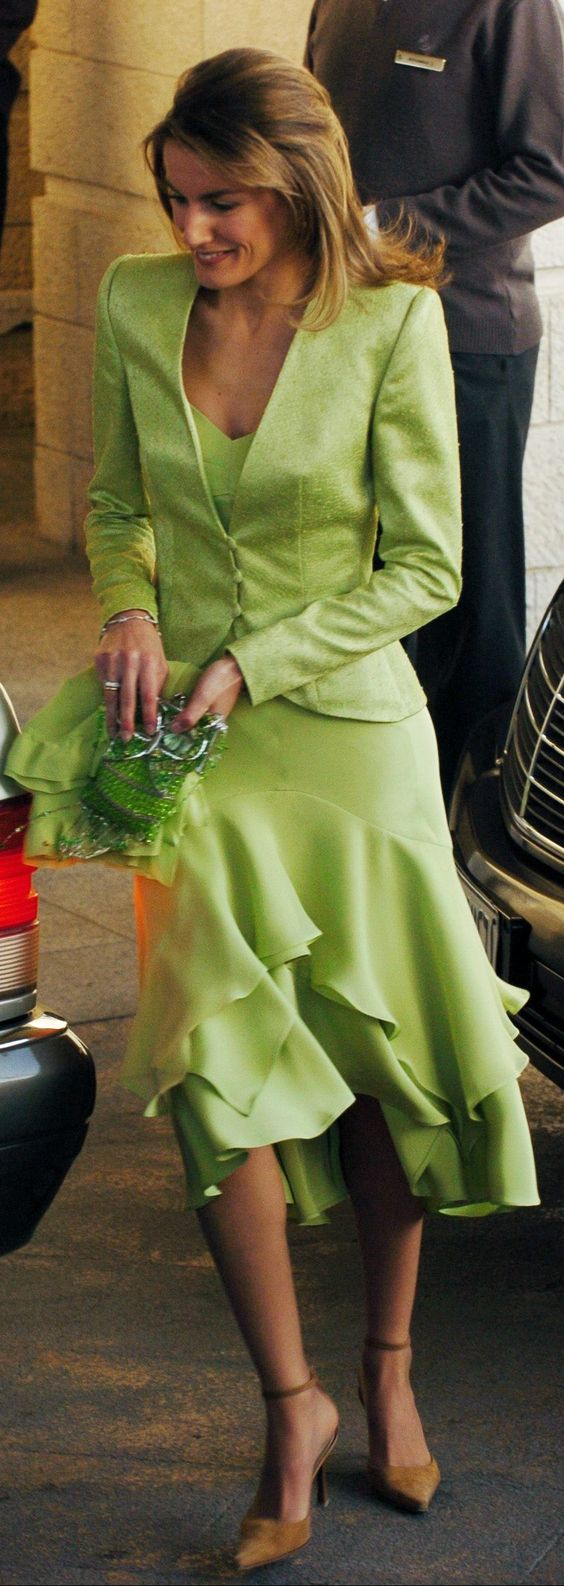 LOVE THIS DRESS! Princess Letizia of Spain